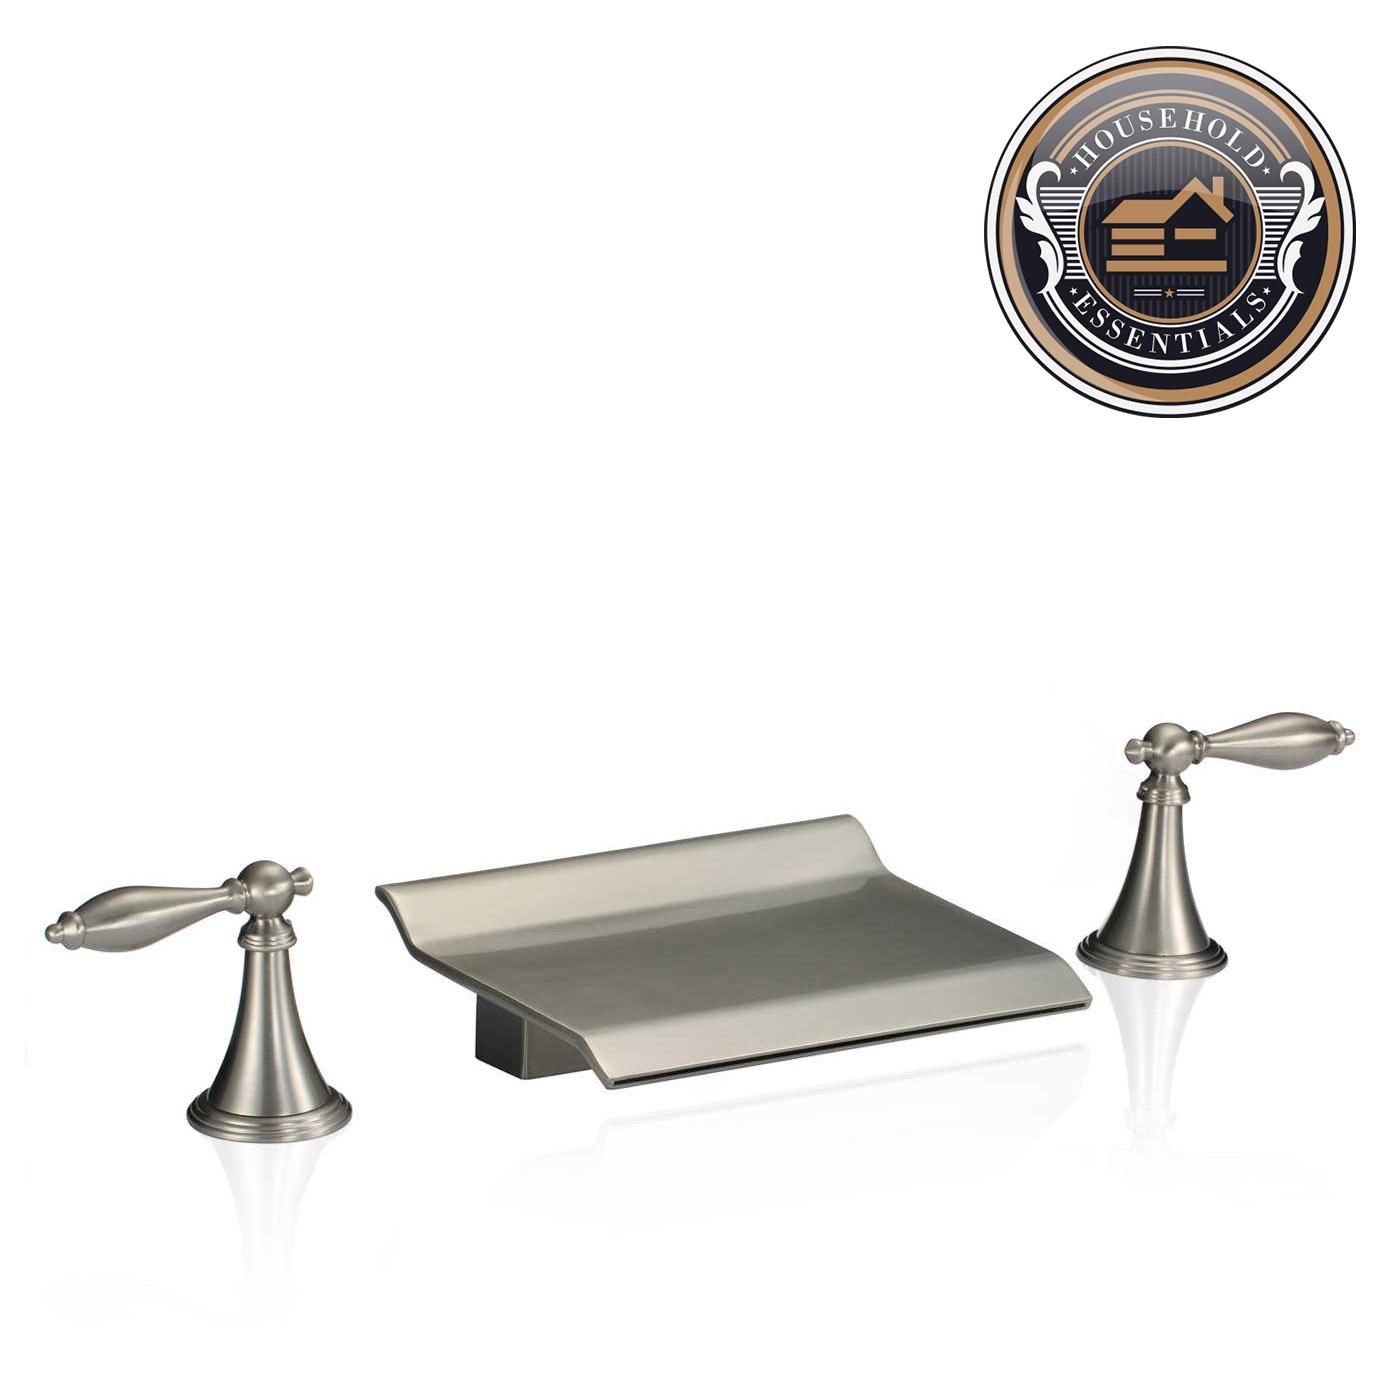 4 Tall Widespread Bathroom Sink Roman Tub Waterfall